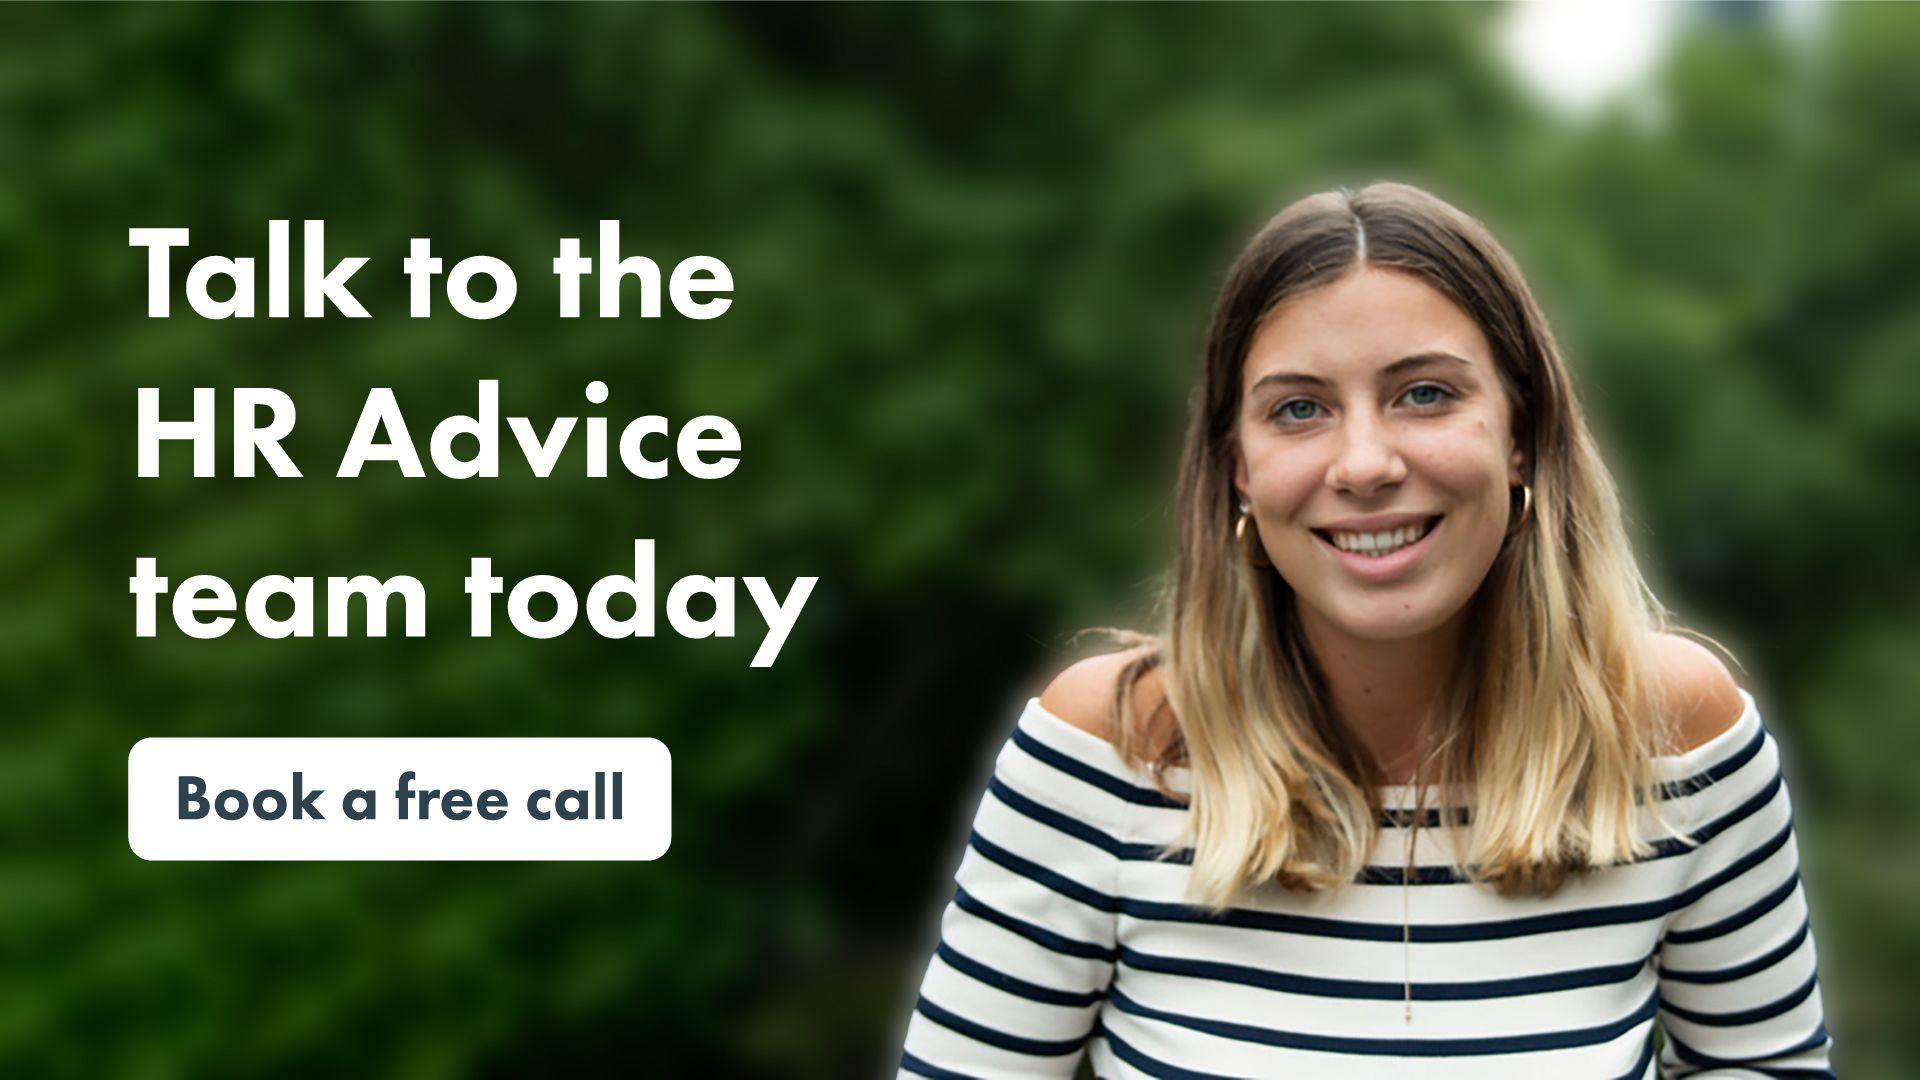 Talk-to-the-HR-Advice-team-today-CTA